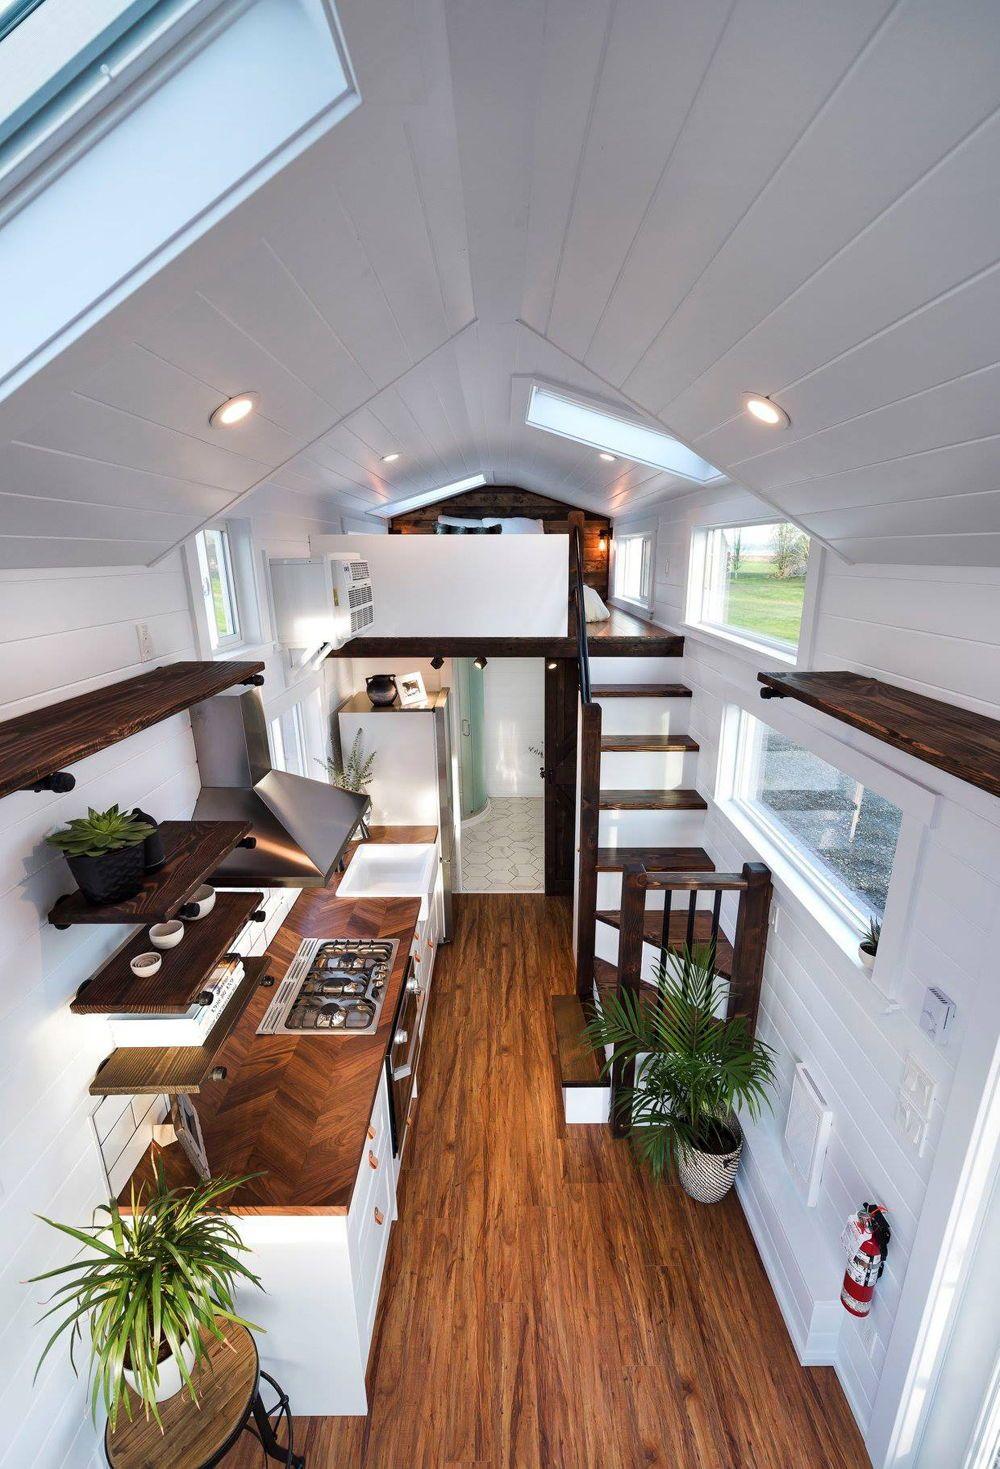 26' Custom Napa Edition by Mint Tiny Homes   Tiny house ... on woodland house design, nipa house design, seaside house design, sea ranch house design, joshua tree house design,